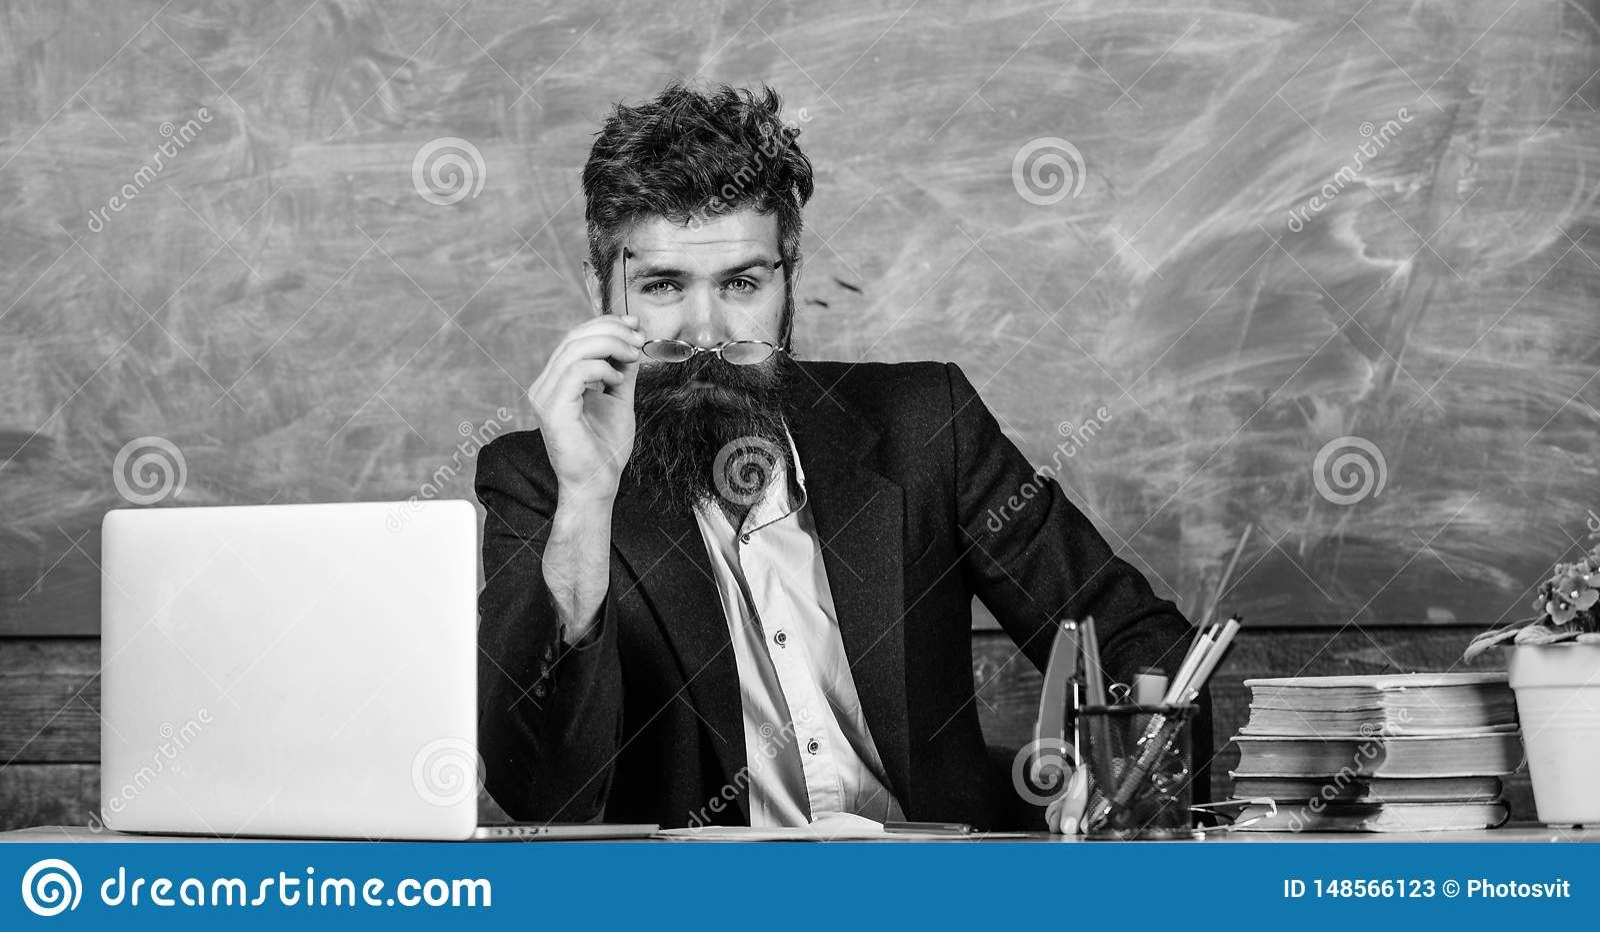 Teacher formal wear sit table classroom chalkboard background. Teacher concentrated bearded mature schoolmaster